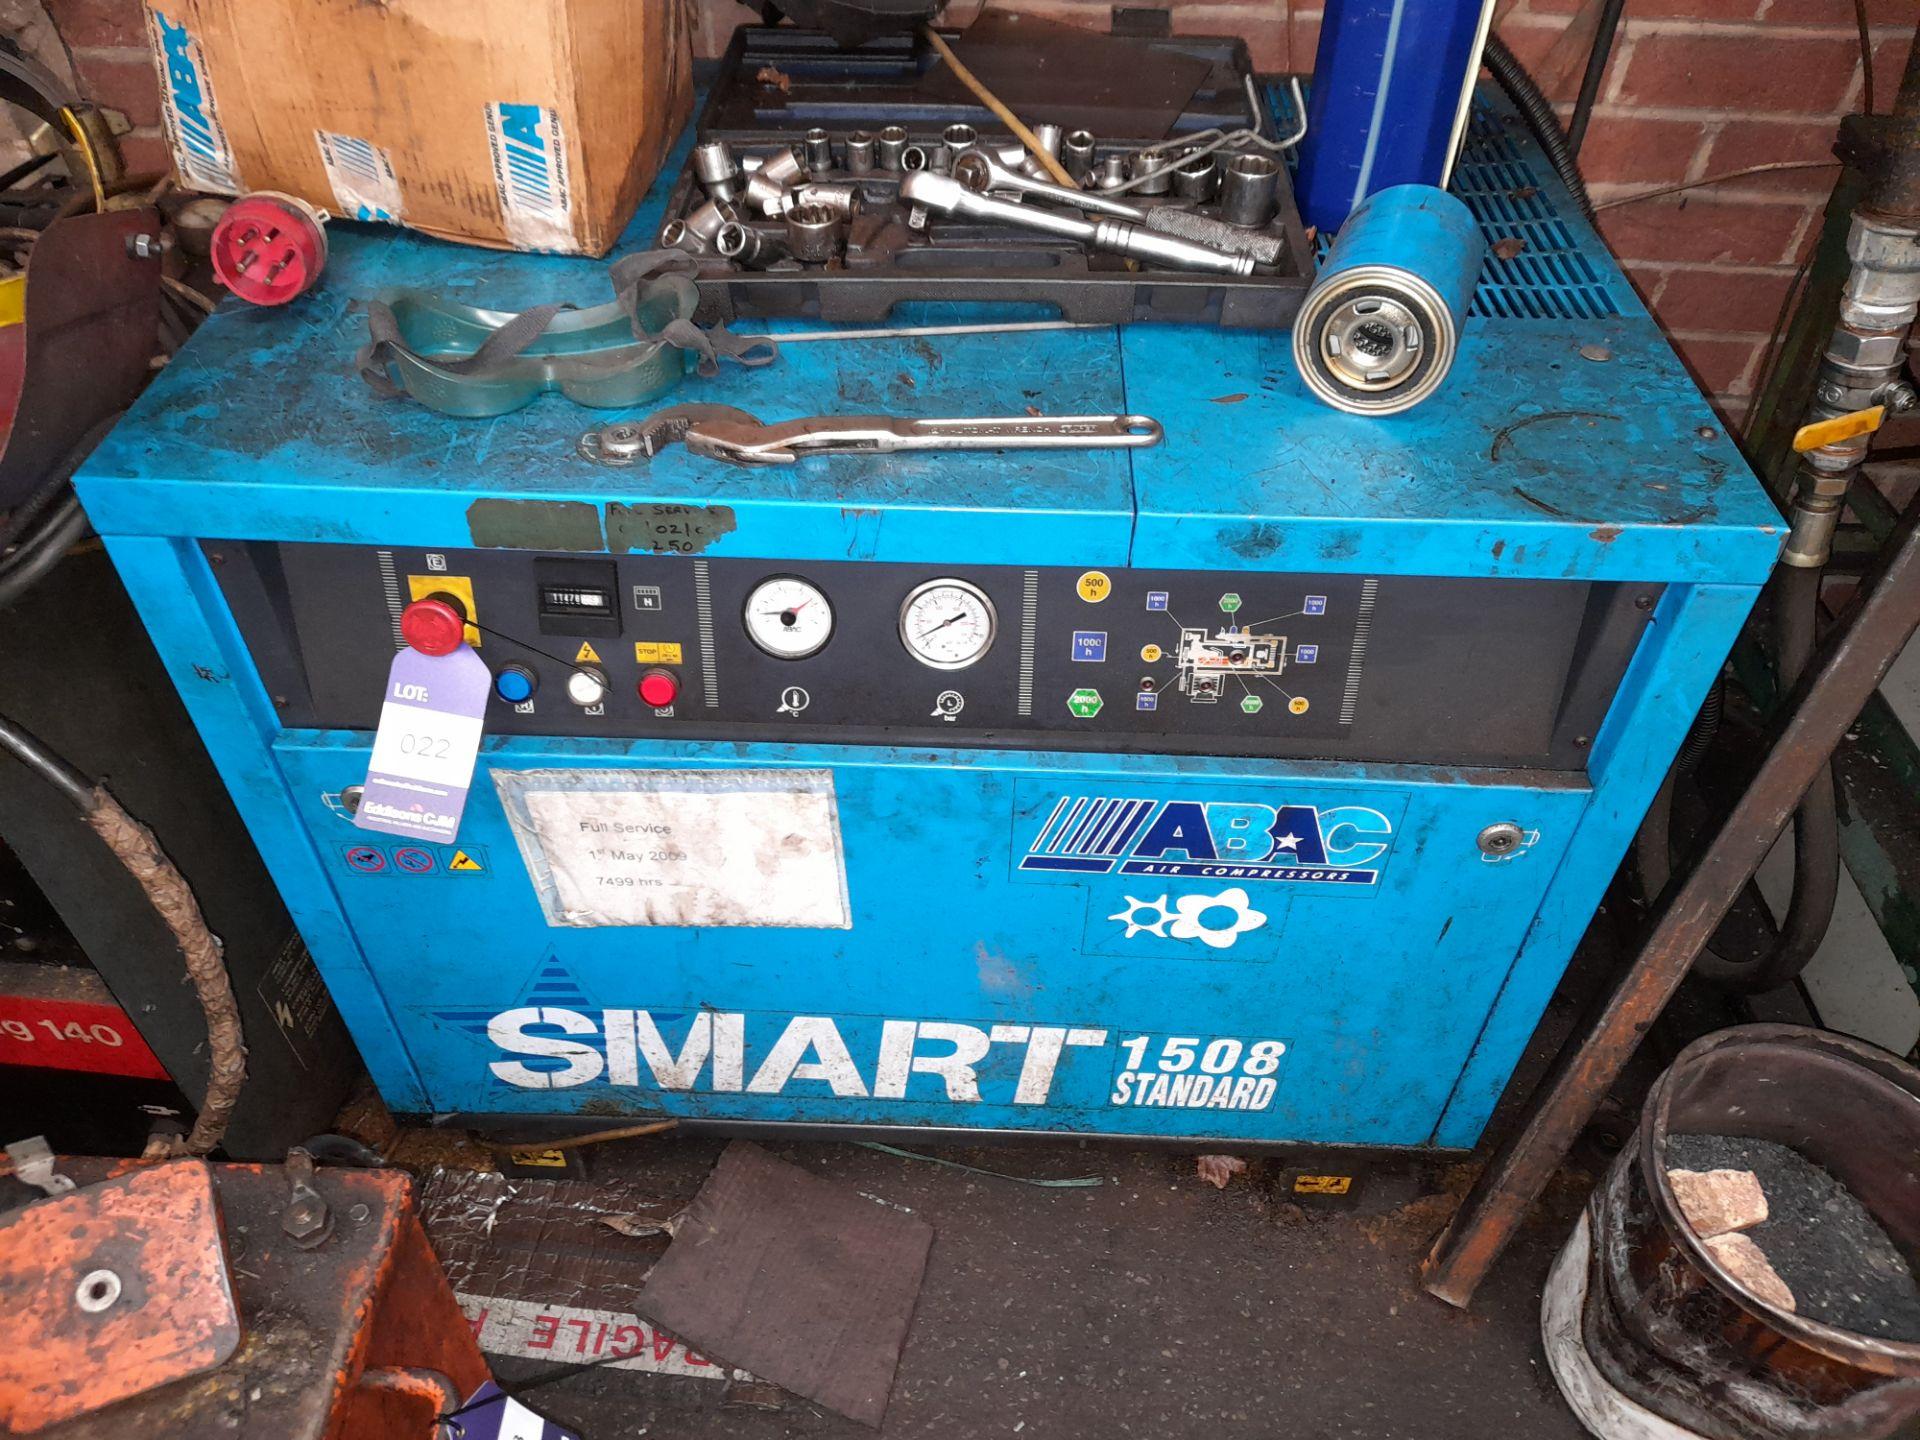 ABAC Smart 1508 Standard Packaged Air Compressor